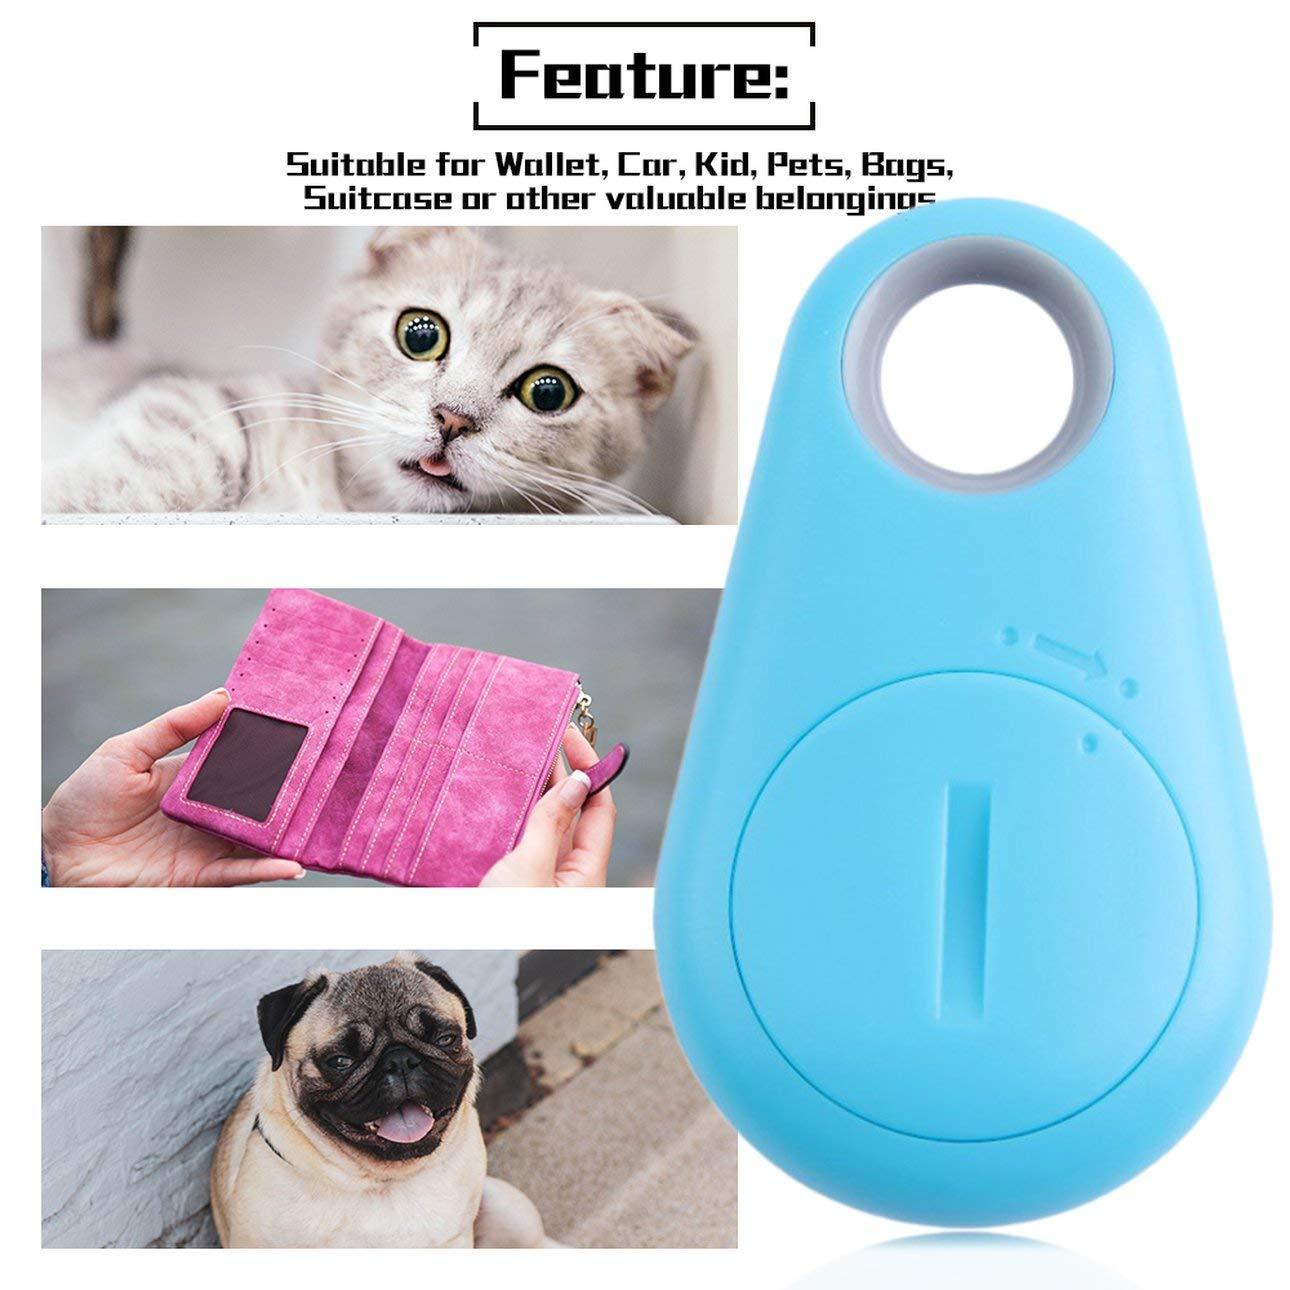 Liobaba Omnidirectional Anti-Lost Alarm Loud Beep Smart 4.0 Remote Tracer Pet Child GPS Locator Tag Alarm Key Seeker